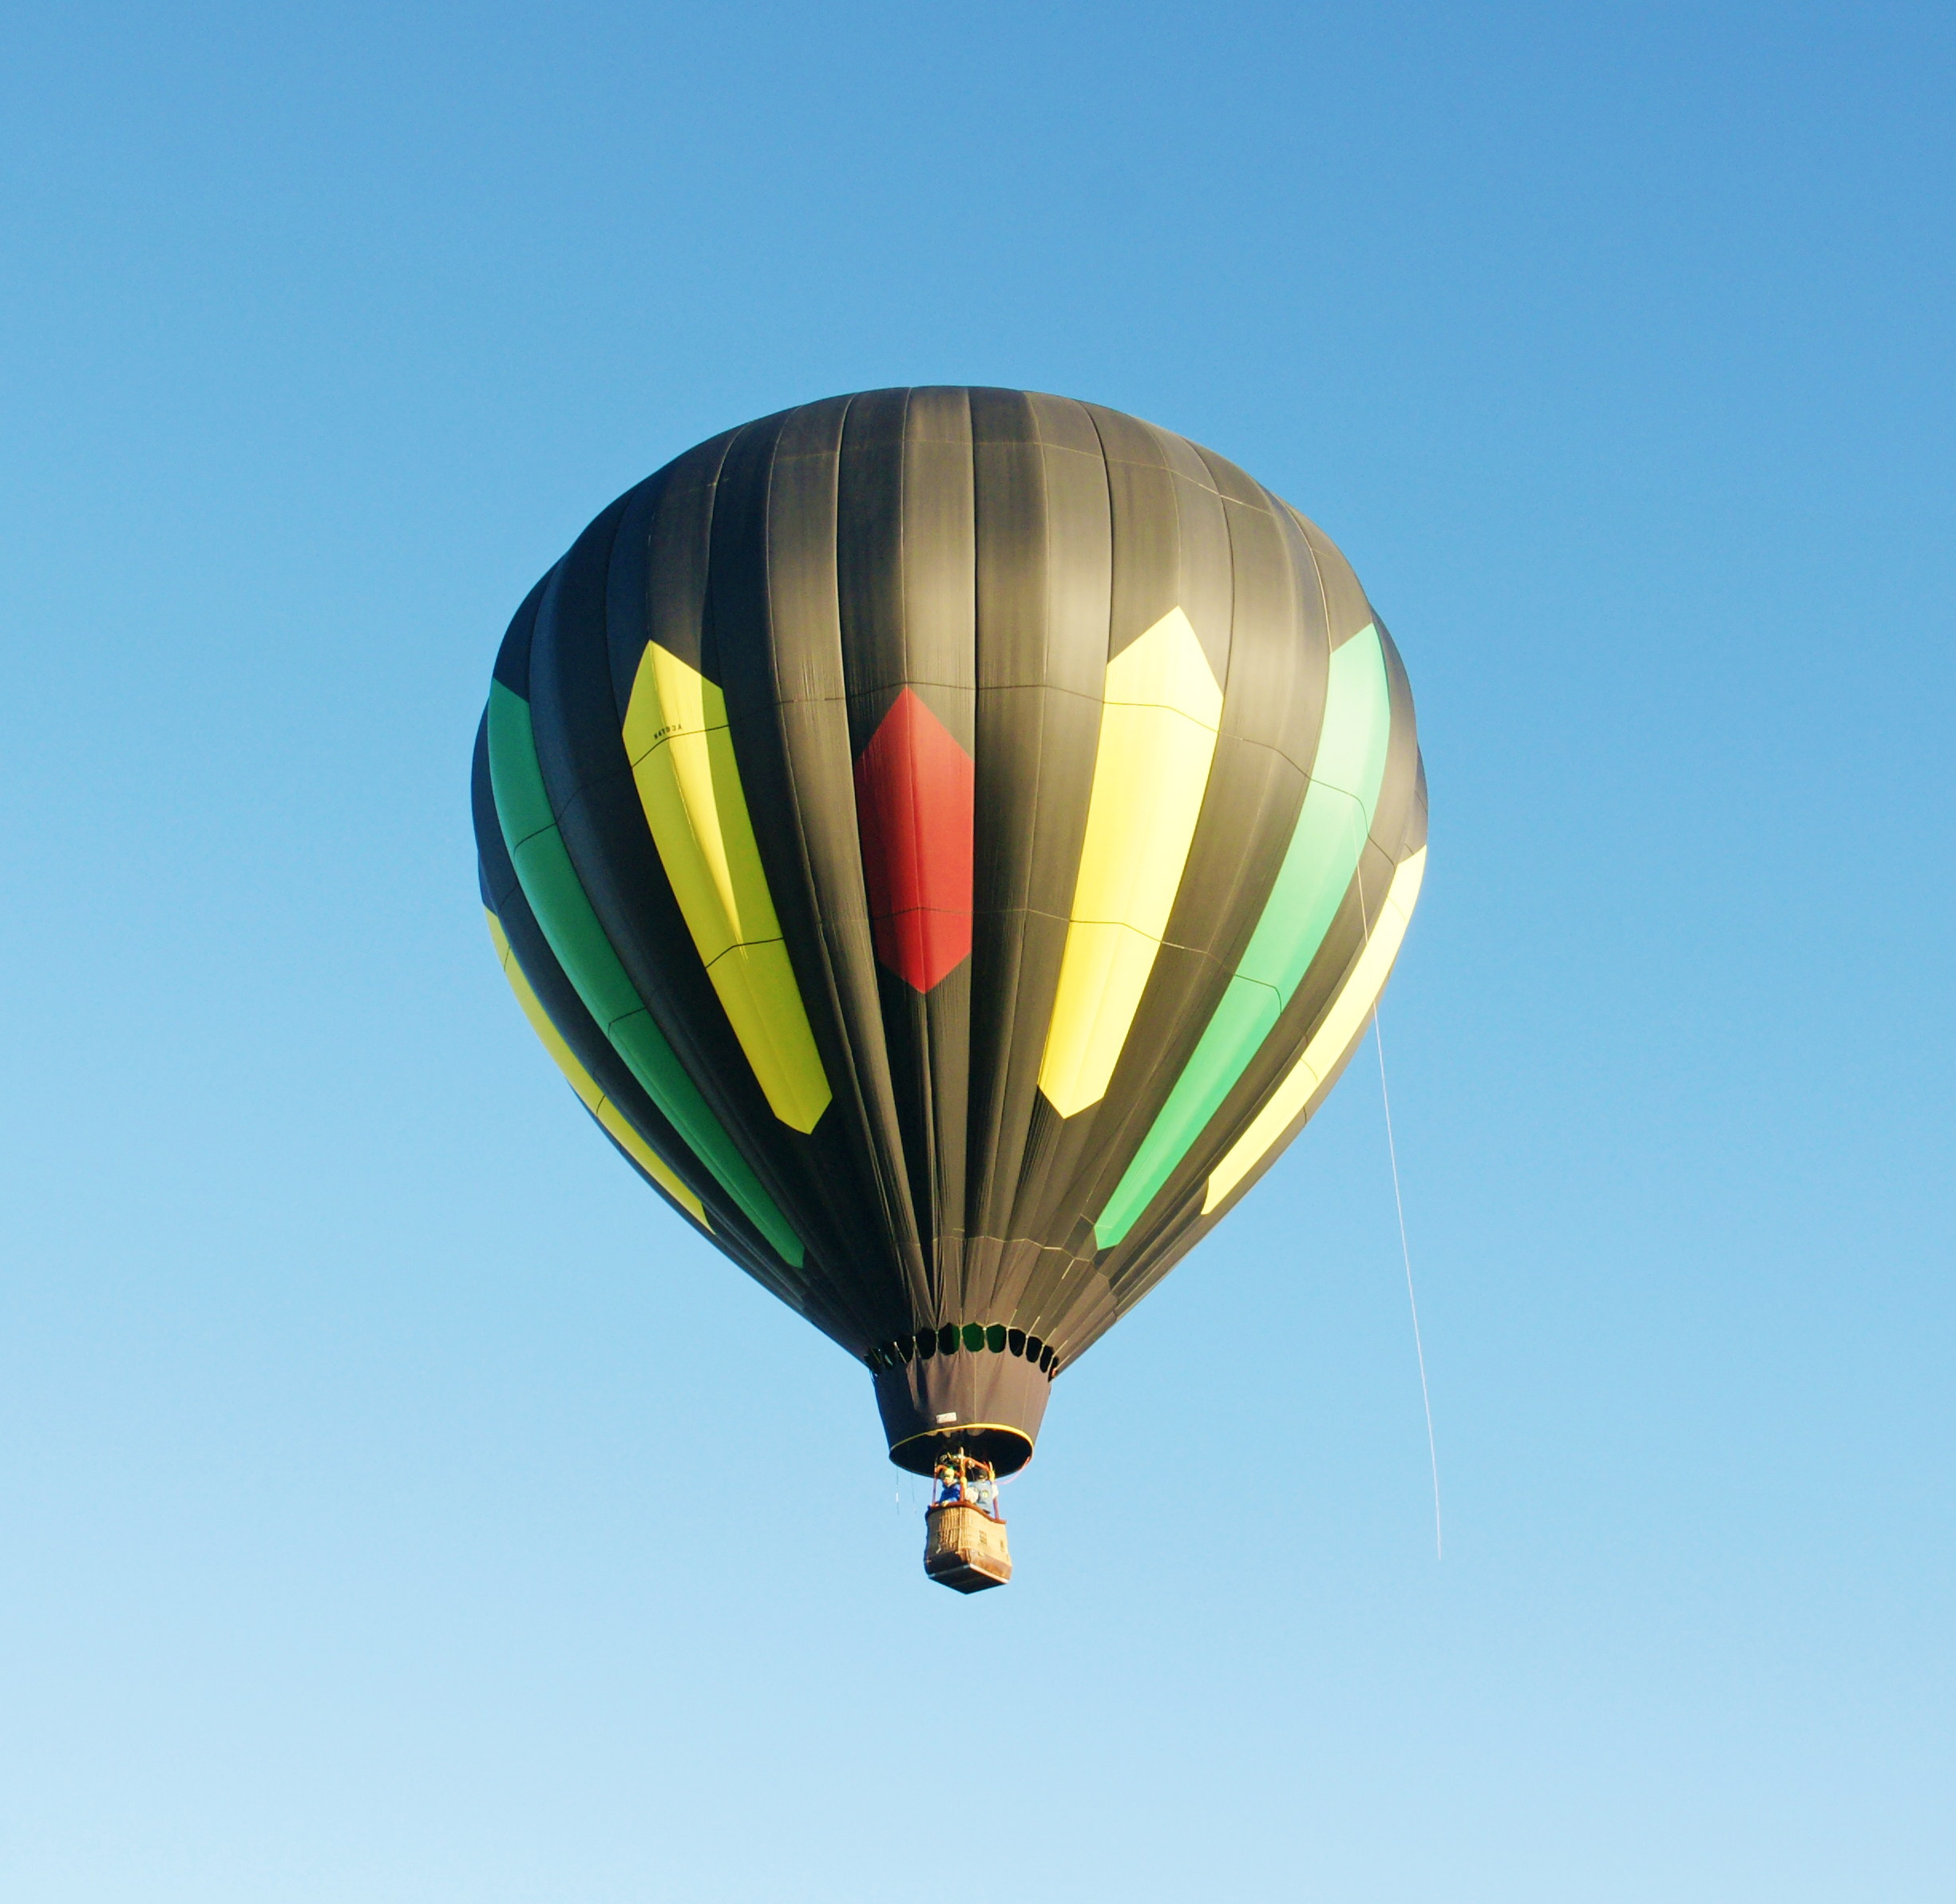 aibf-Single-Balloons-Gallery09